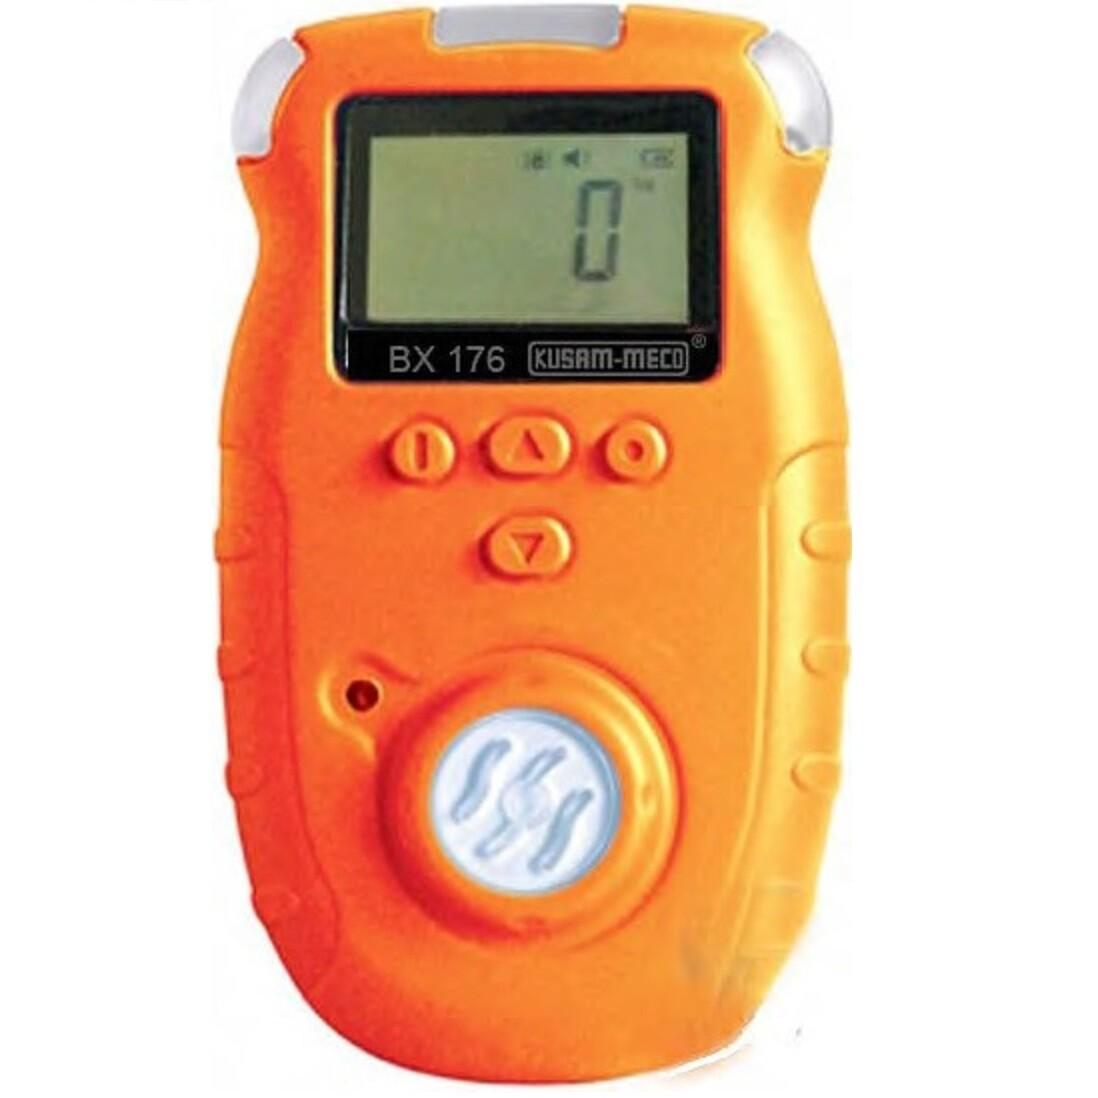 Kusam Meco BX176 - Intrinsically Safe Portable Oxygen Detector